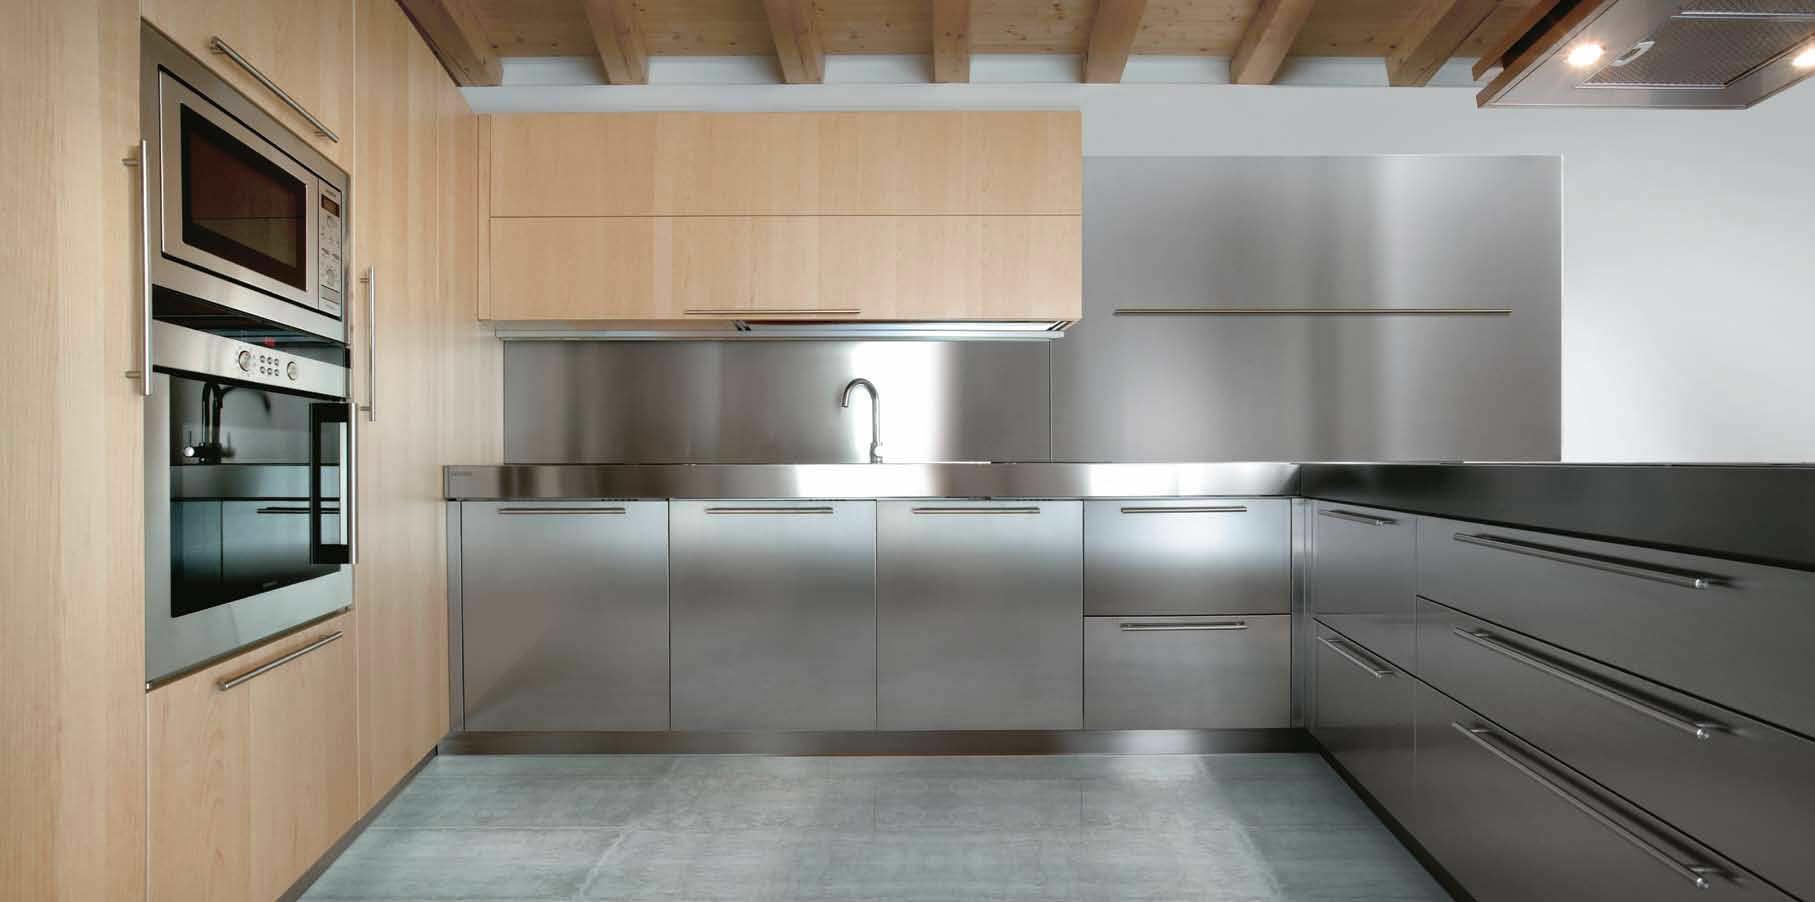 Moderne küche aus edelstahl aus massivholz holz 01c